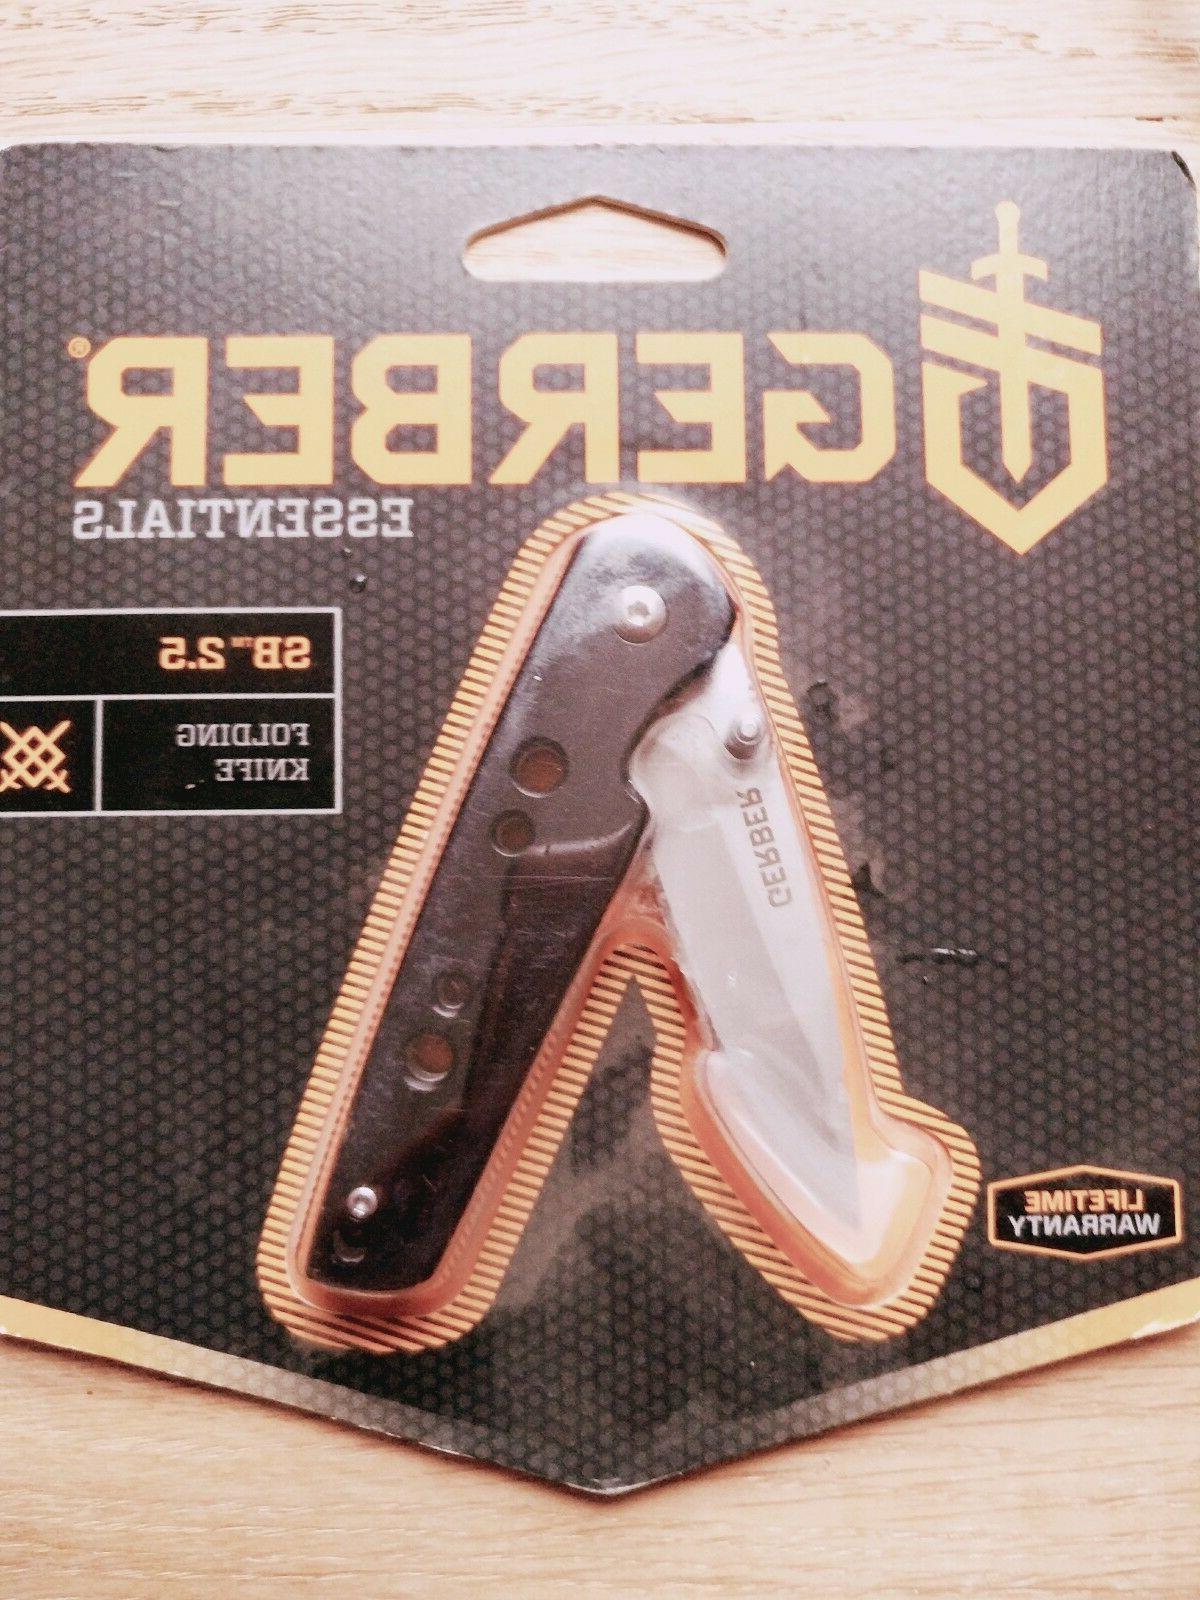 Gerber SB 2.5 Aluminum Handle Folding Pocket Knife